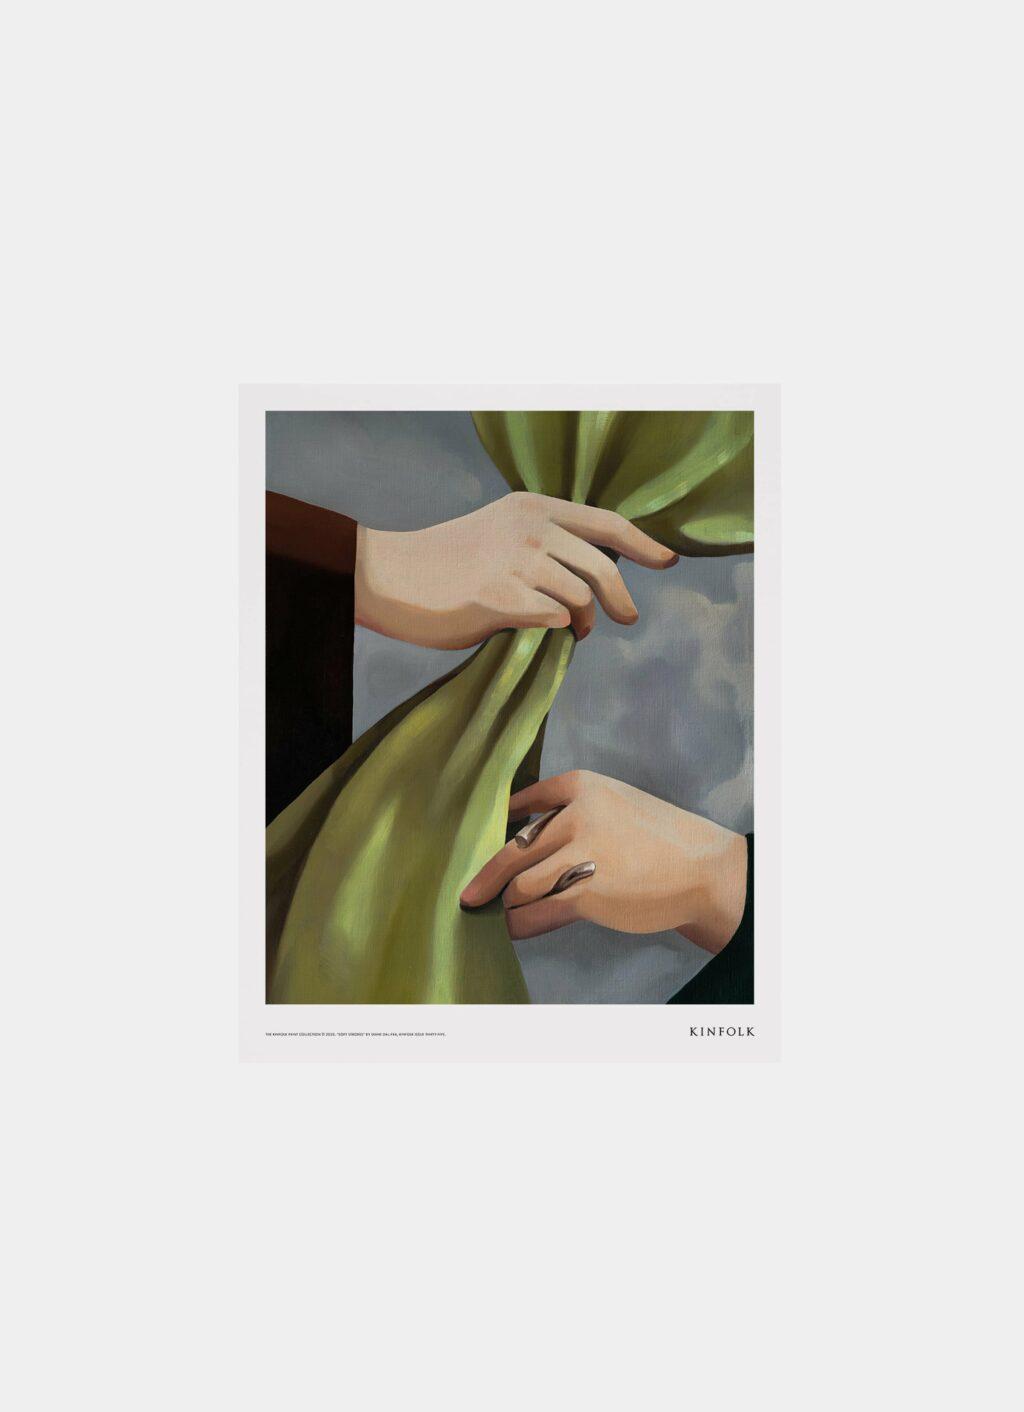 Alium - Kinfolk Print Collection - Diana Dal-Pra - Soft Strokes 02 - 40x50cm